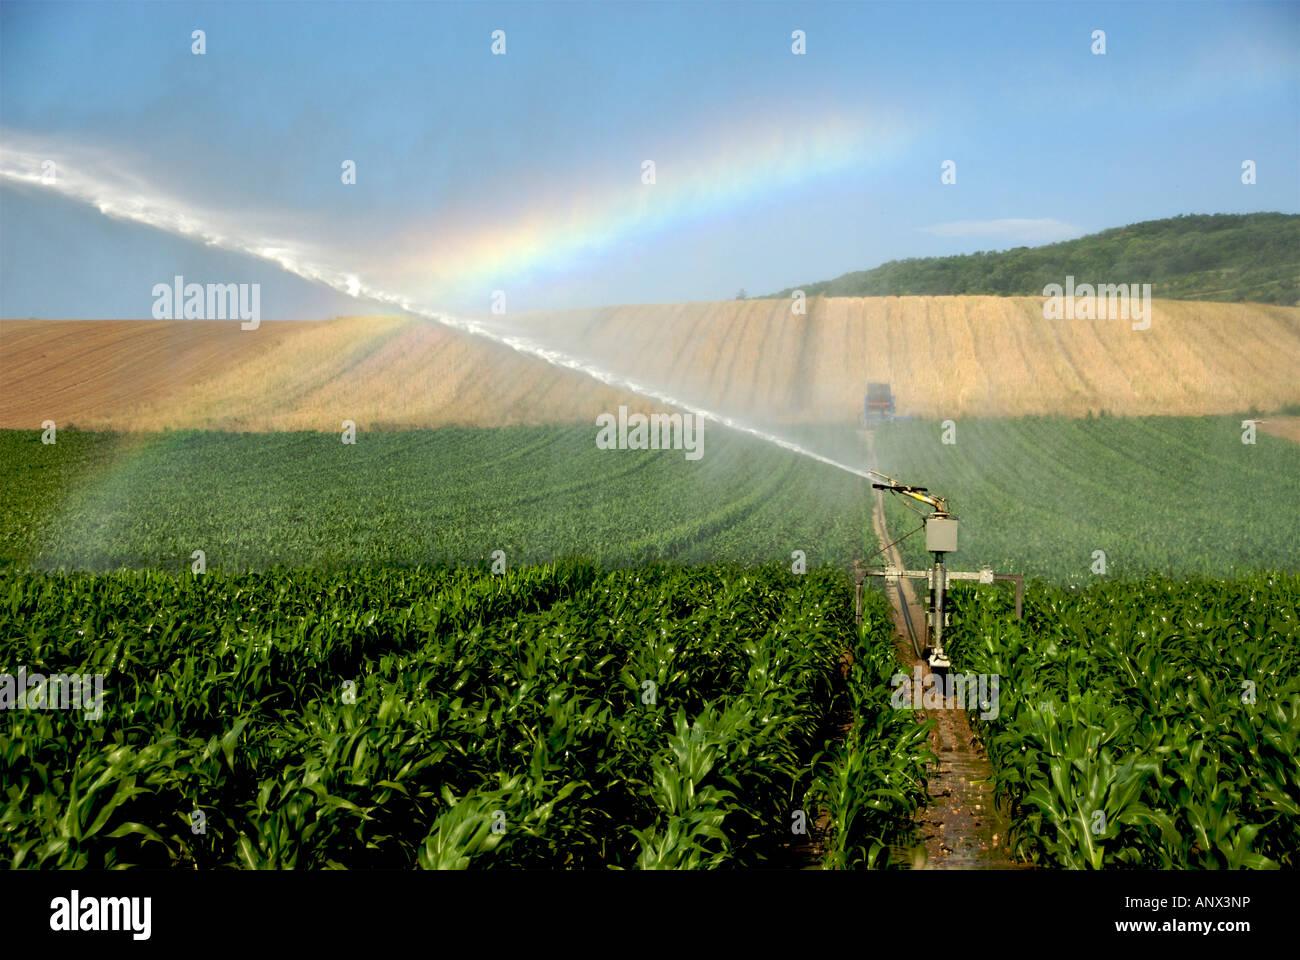 Sprinkler installation in a field of maize, Limagne, Auvergne, France, Europe - Stock Image